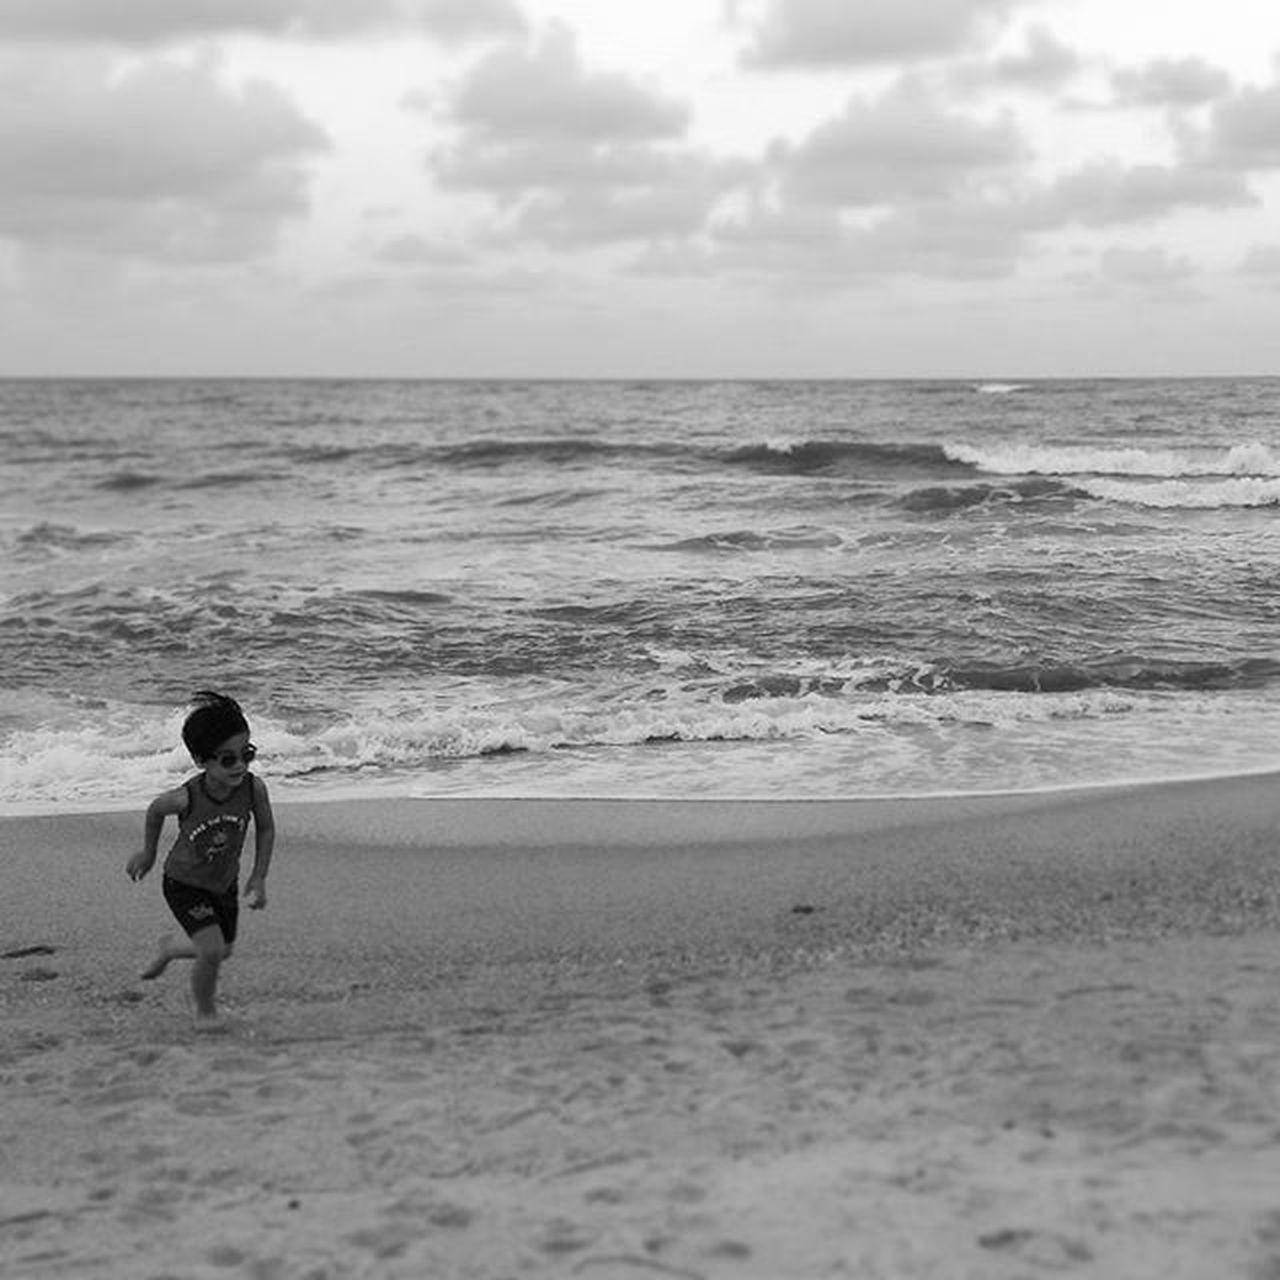 Run baby run ! TokJembal Dapopata Terengganu Malaysia Malaysians Beach Kid The Portraitist - 2016 EyeEm Awards